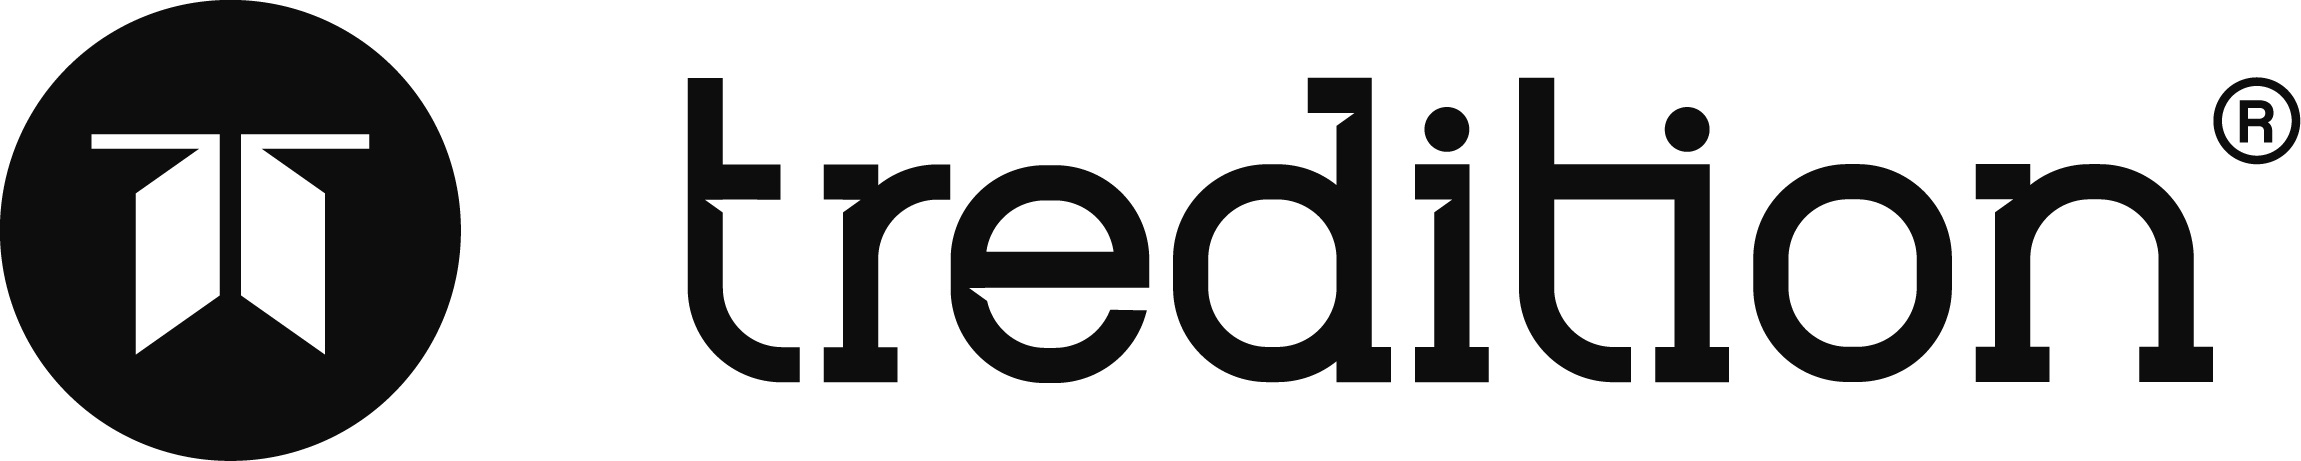 https://0501.nccdn.net/4_2/000/000/000/389/Logo-tredition-JPG-2301x461.jpg